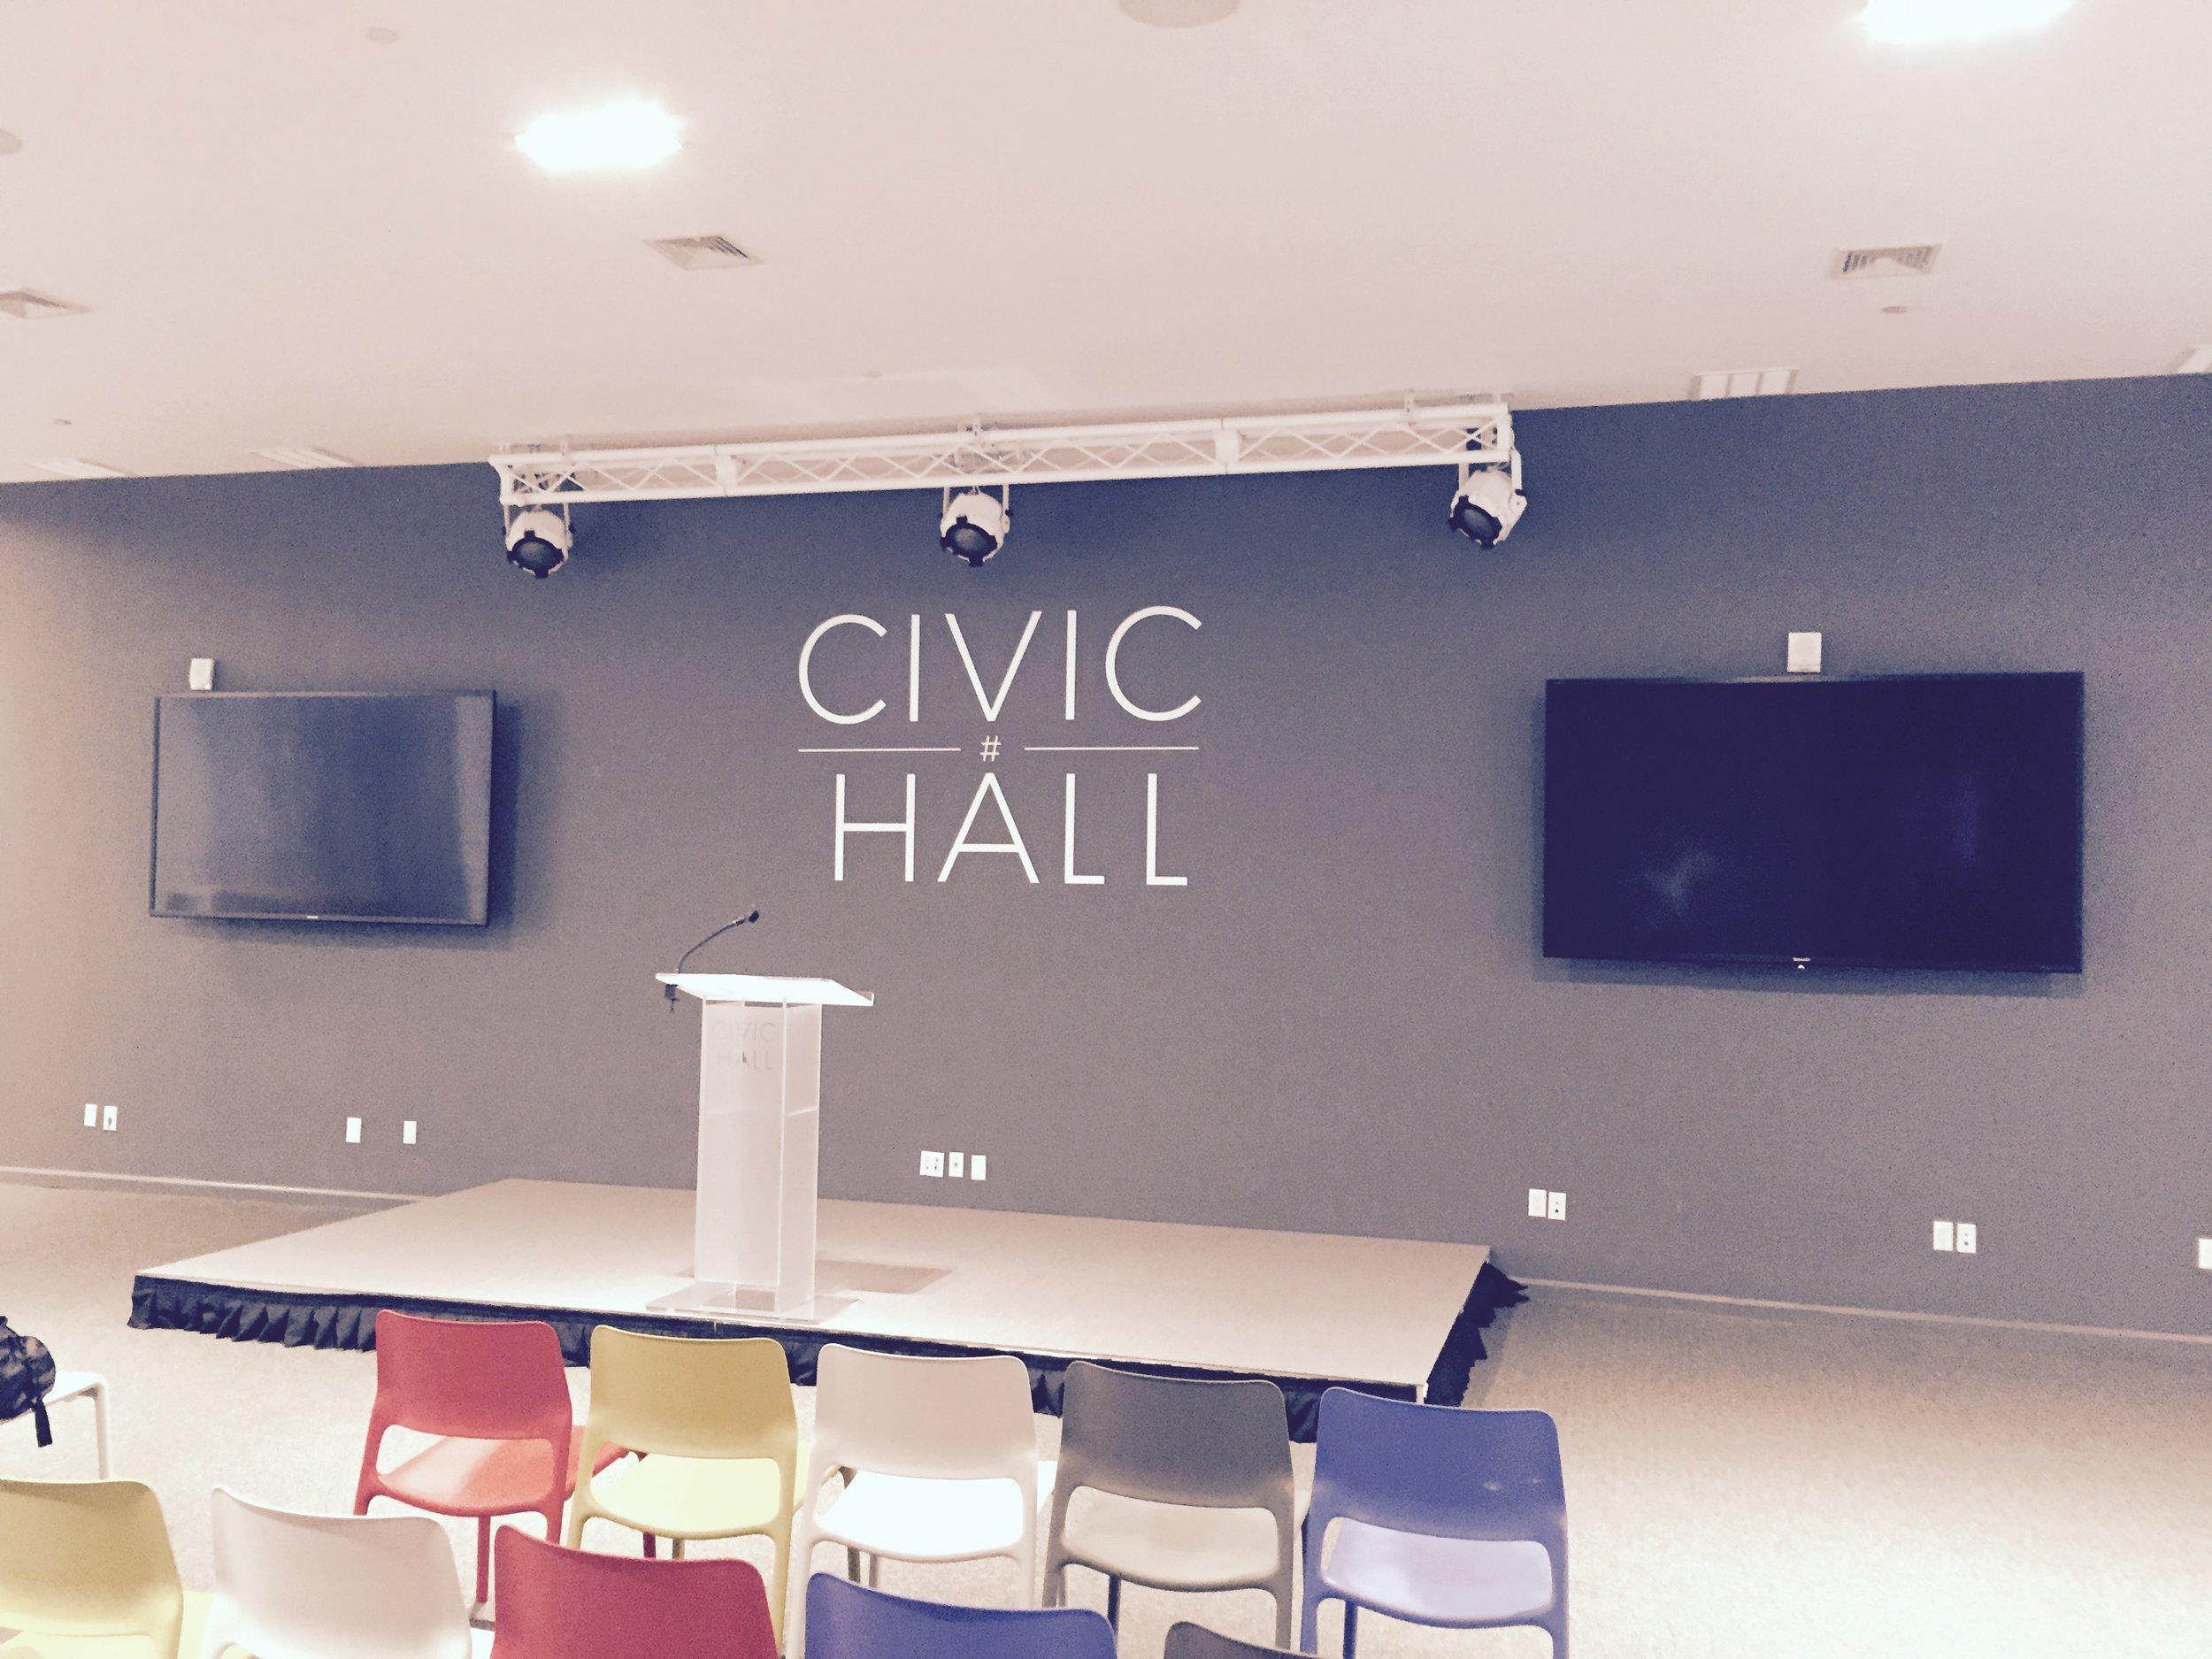 Civic_Hall.jpg